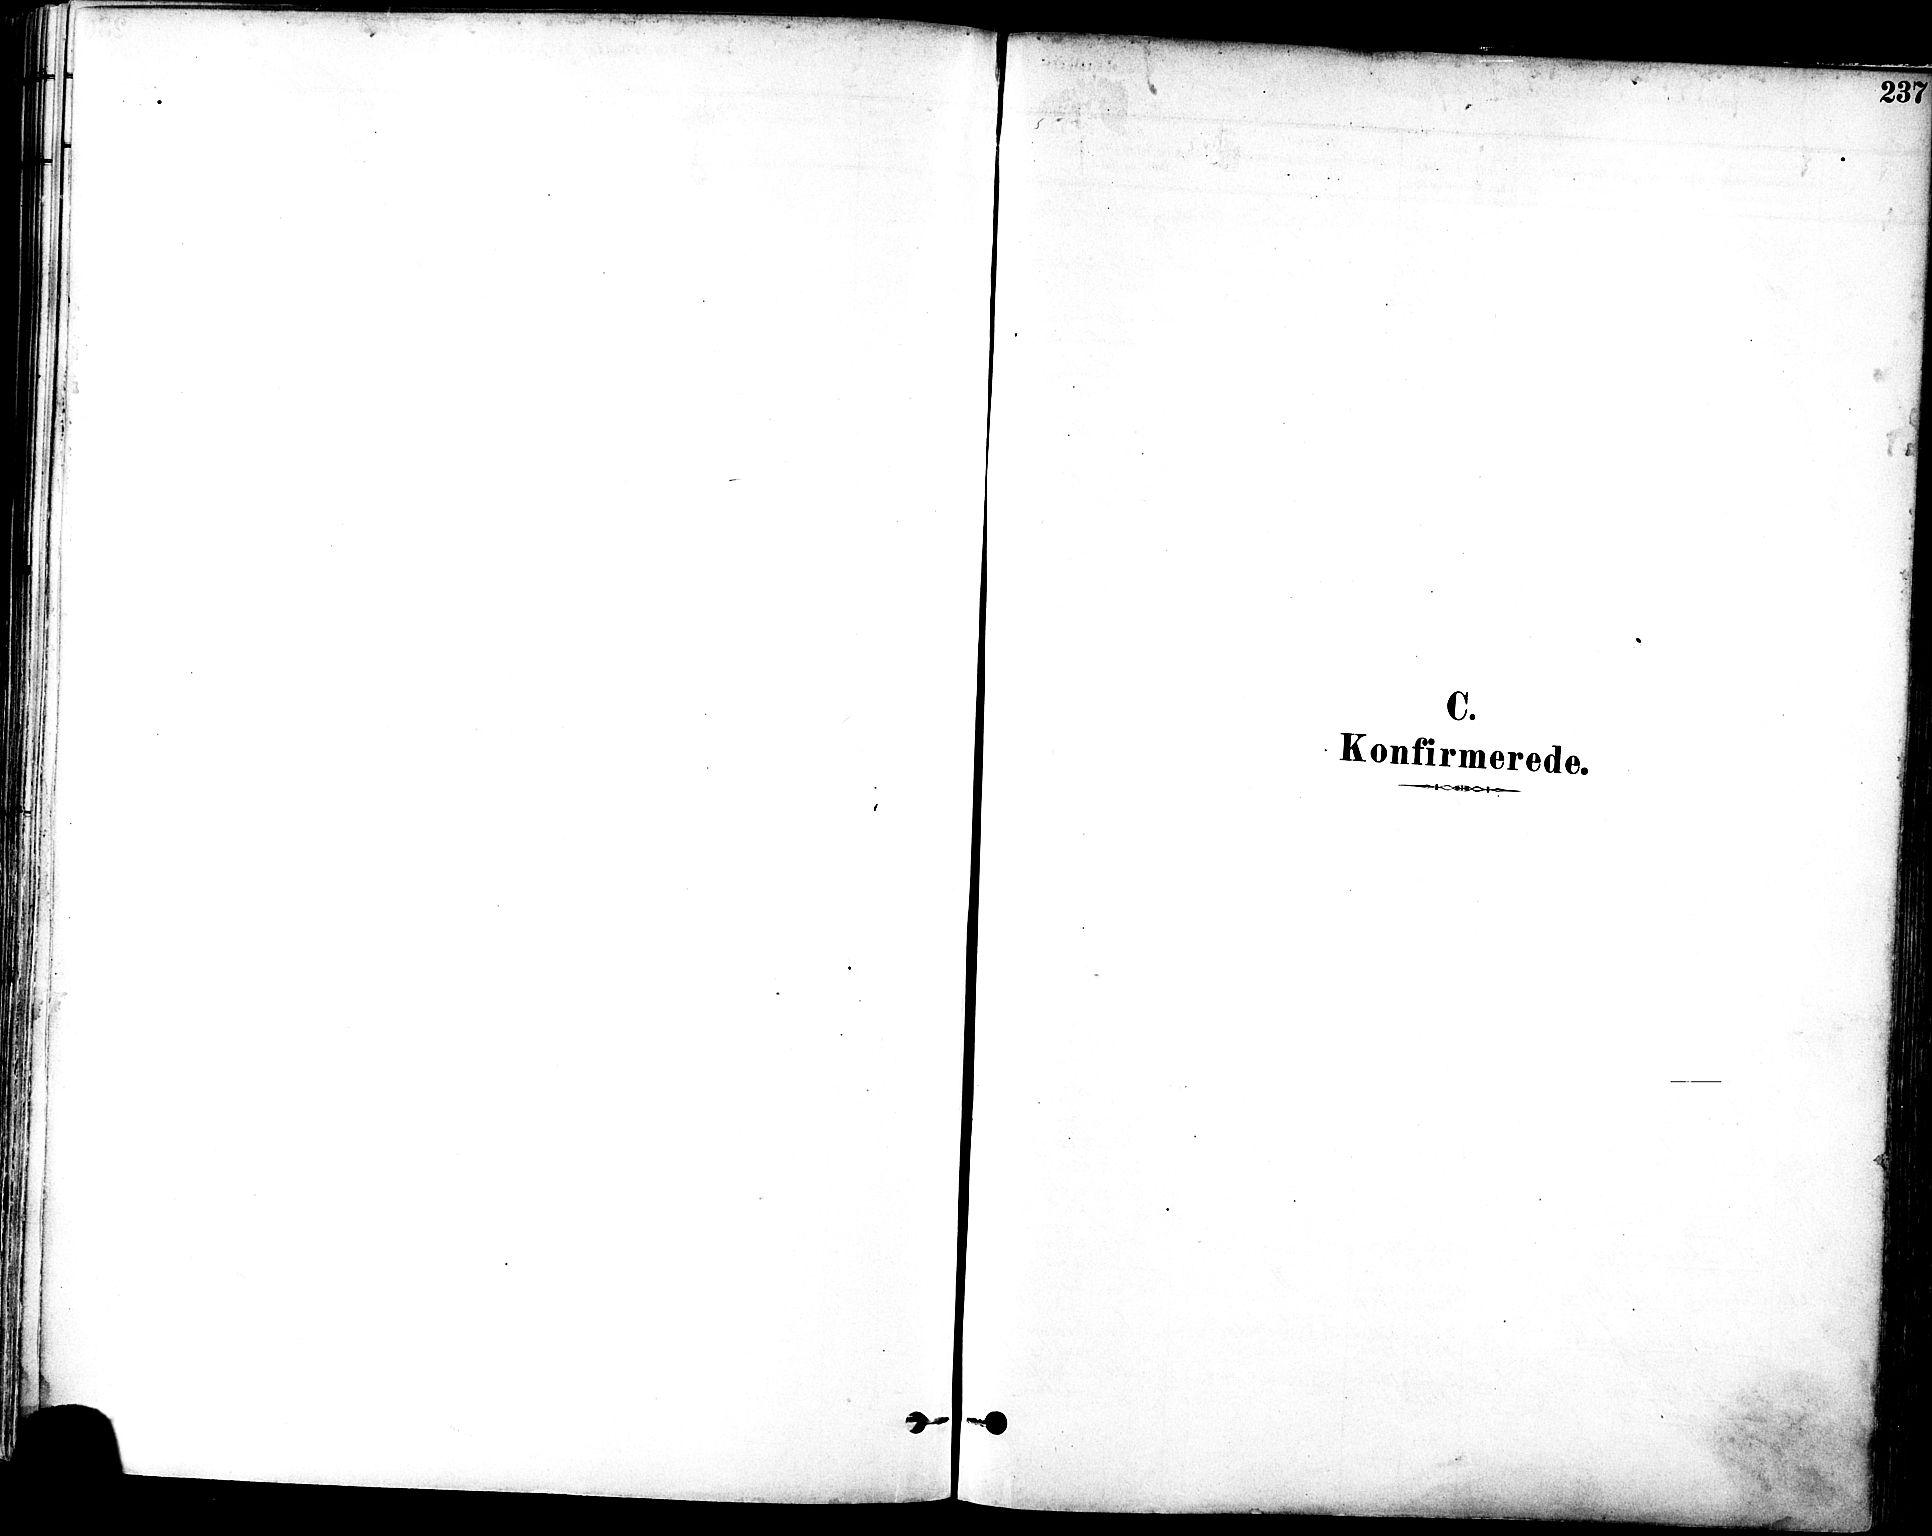 SAT, Ministerialprotokoller, klokkerbøker og fødselsregistre - Sør-Trøndelag, 601/L0057: Parish register (official) no. 601A25, 1877-1891, p. 237